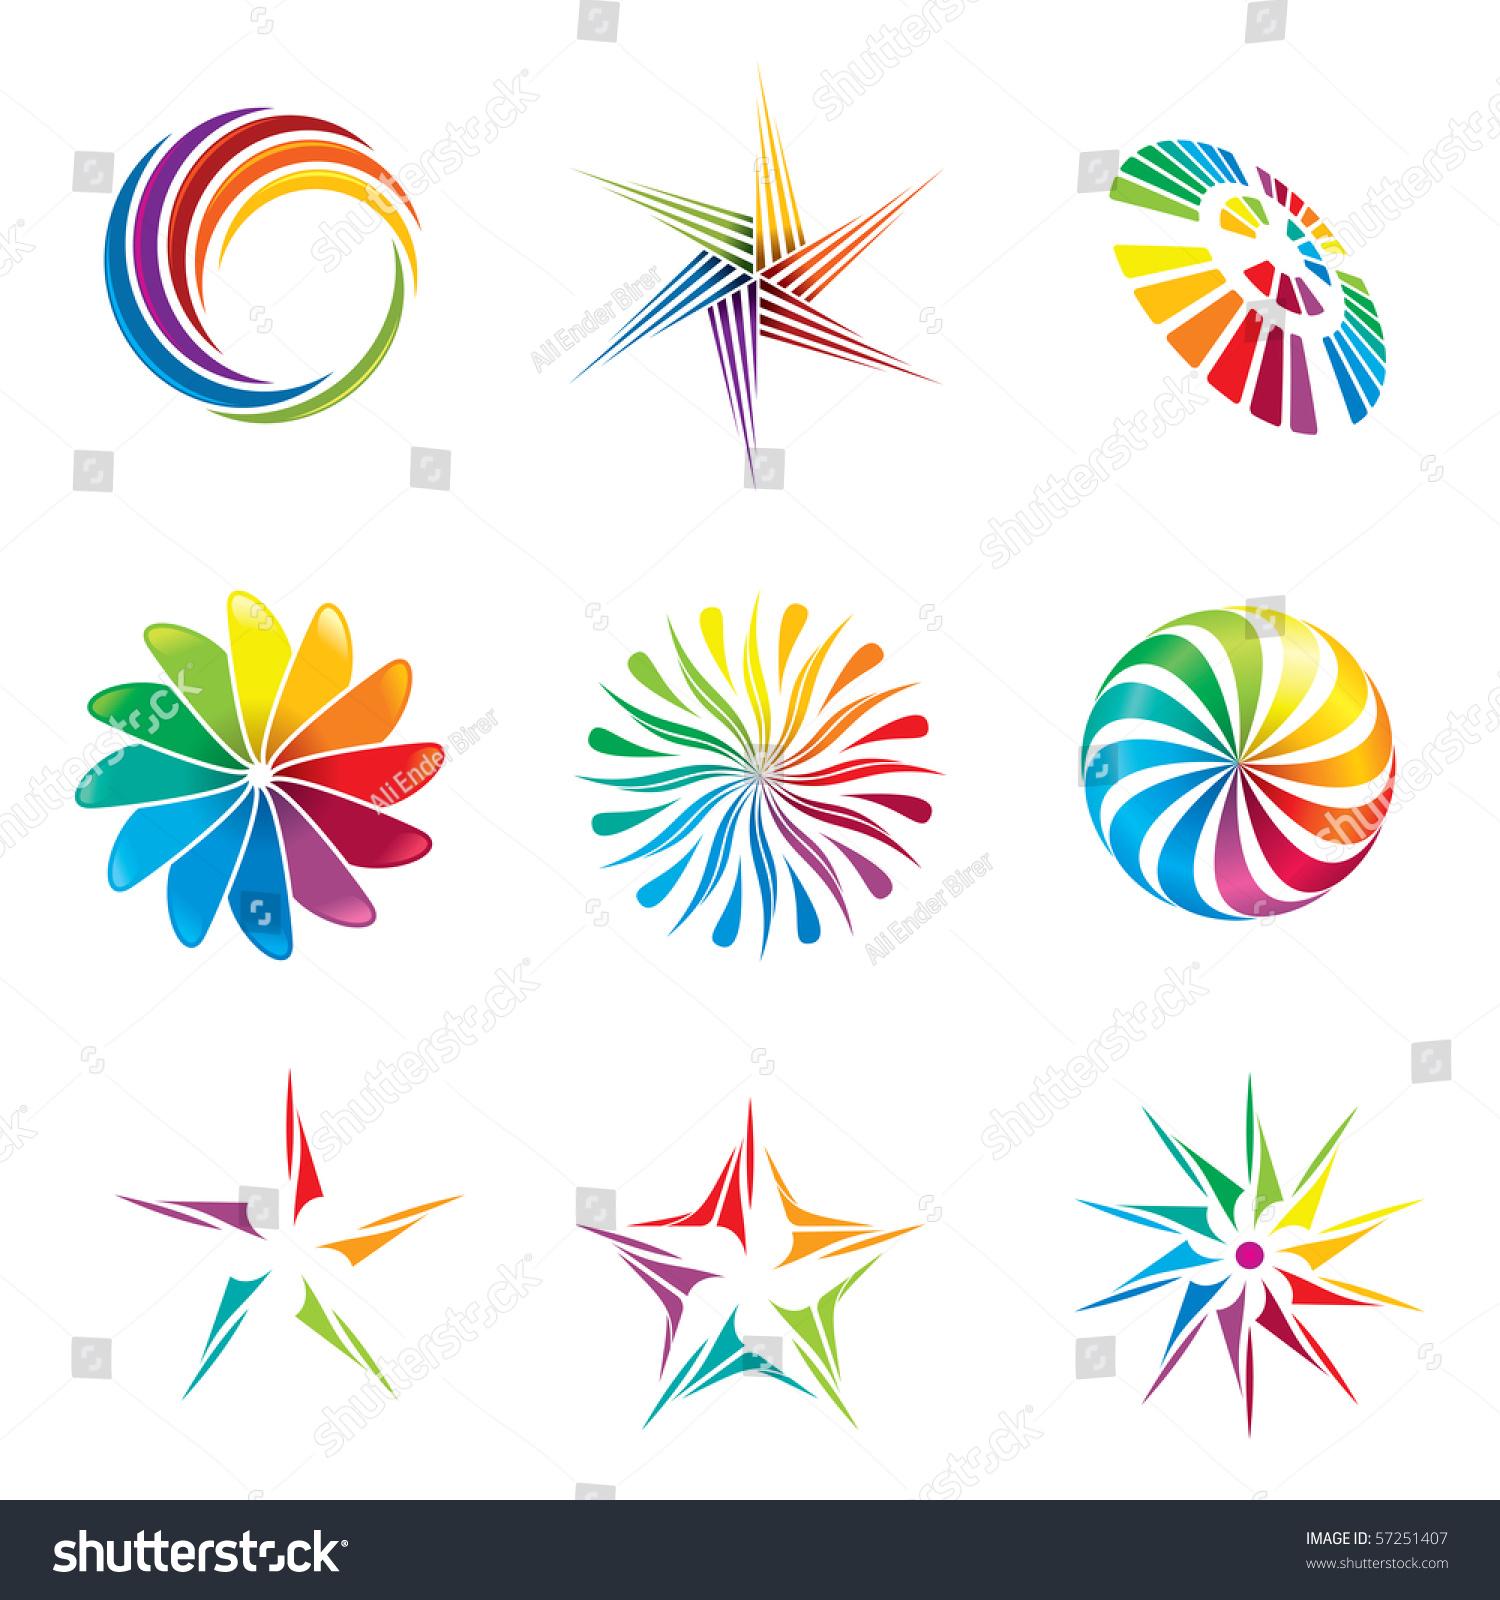 Visual Design Elements : Set colorful graphic design elements stock vector